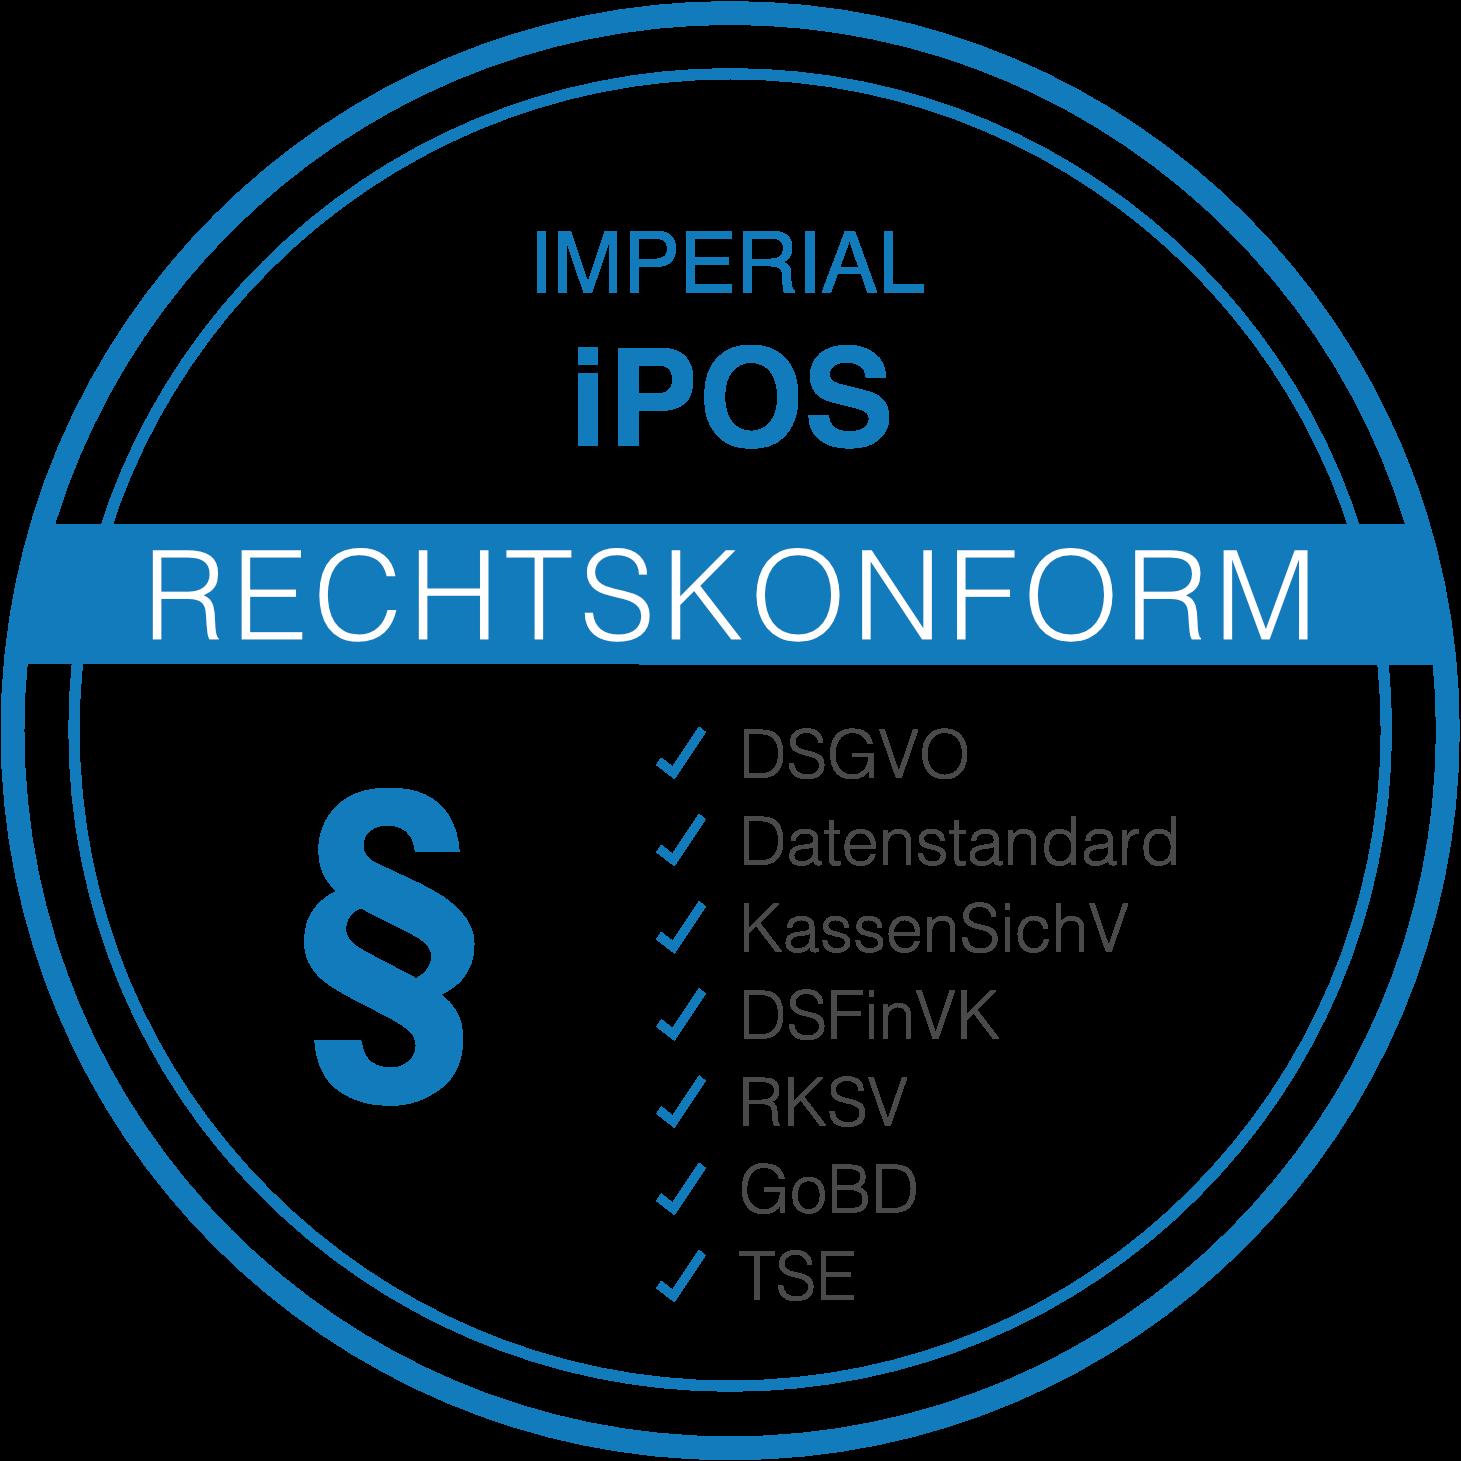 Siegel_Rechtskonform_iPOS_IMPERIAL